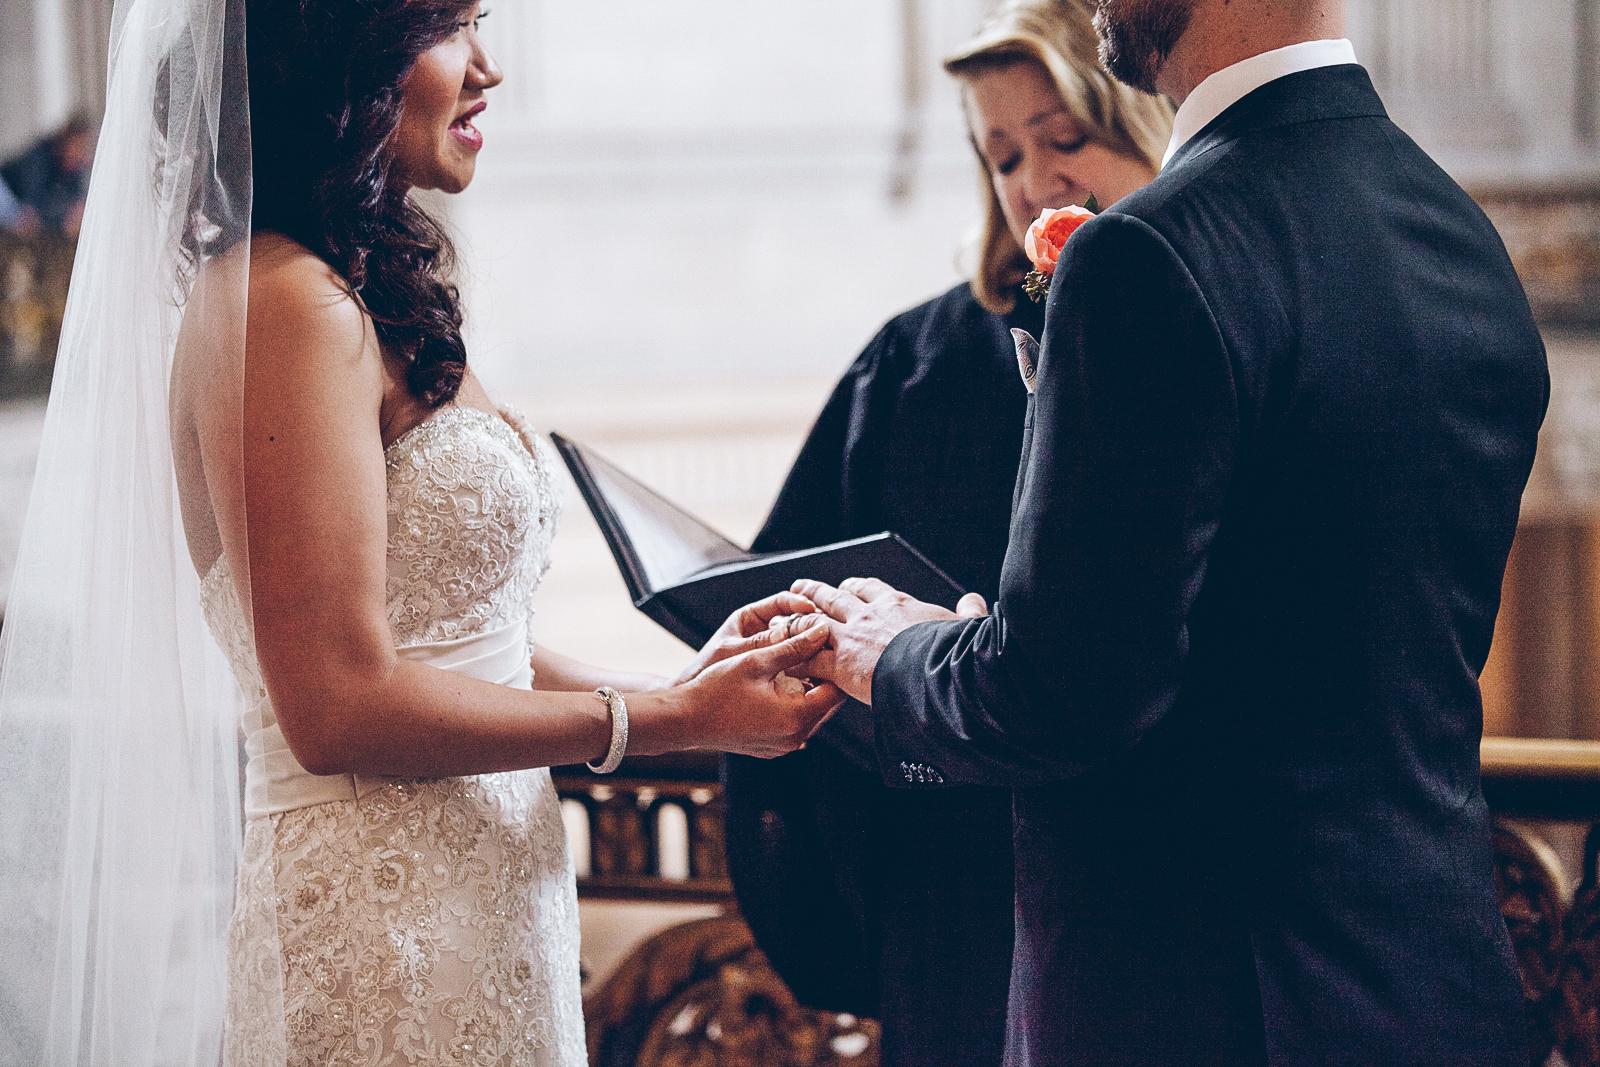 San_francisco_city_hall_wedding_photography_meegan_travis_ebony_siovhan_bokeh_photography_20.jpg